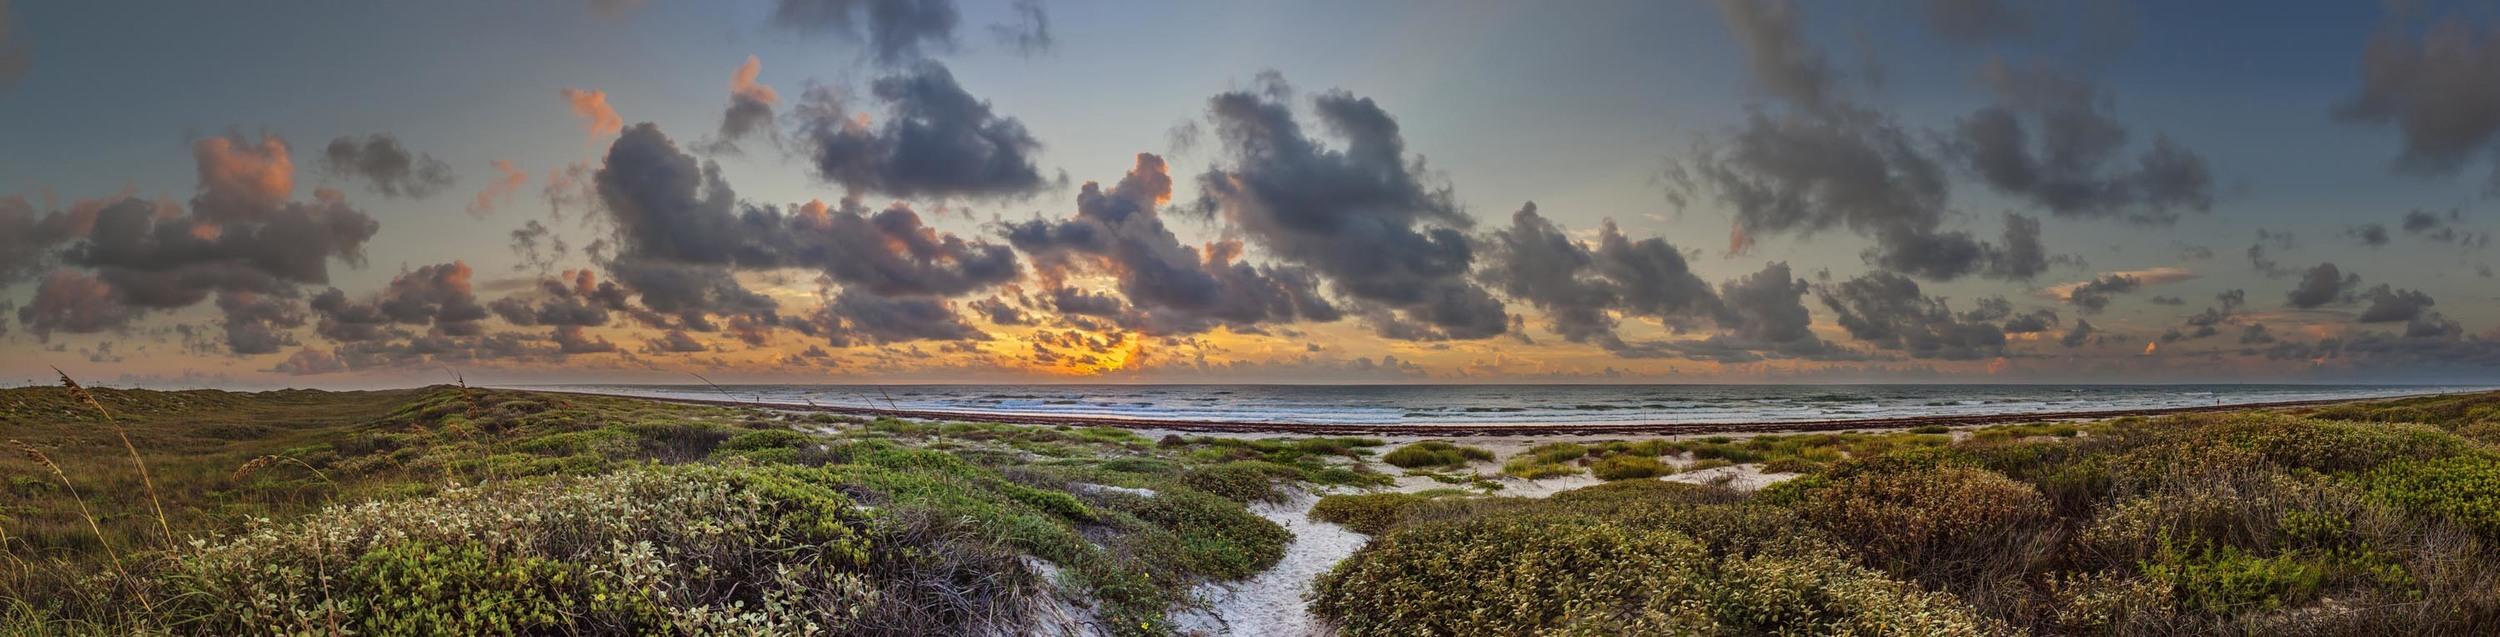 Texas Gulf Coast Sunrise, 2015 ed.jpg